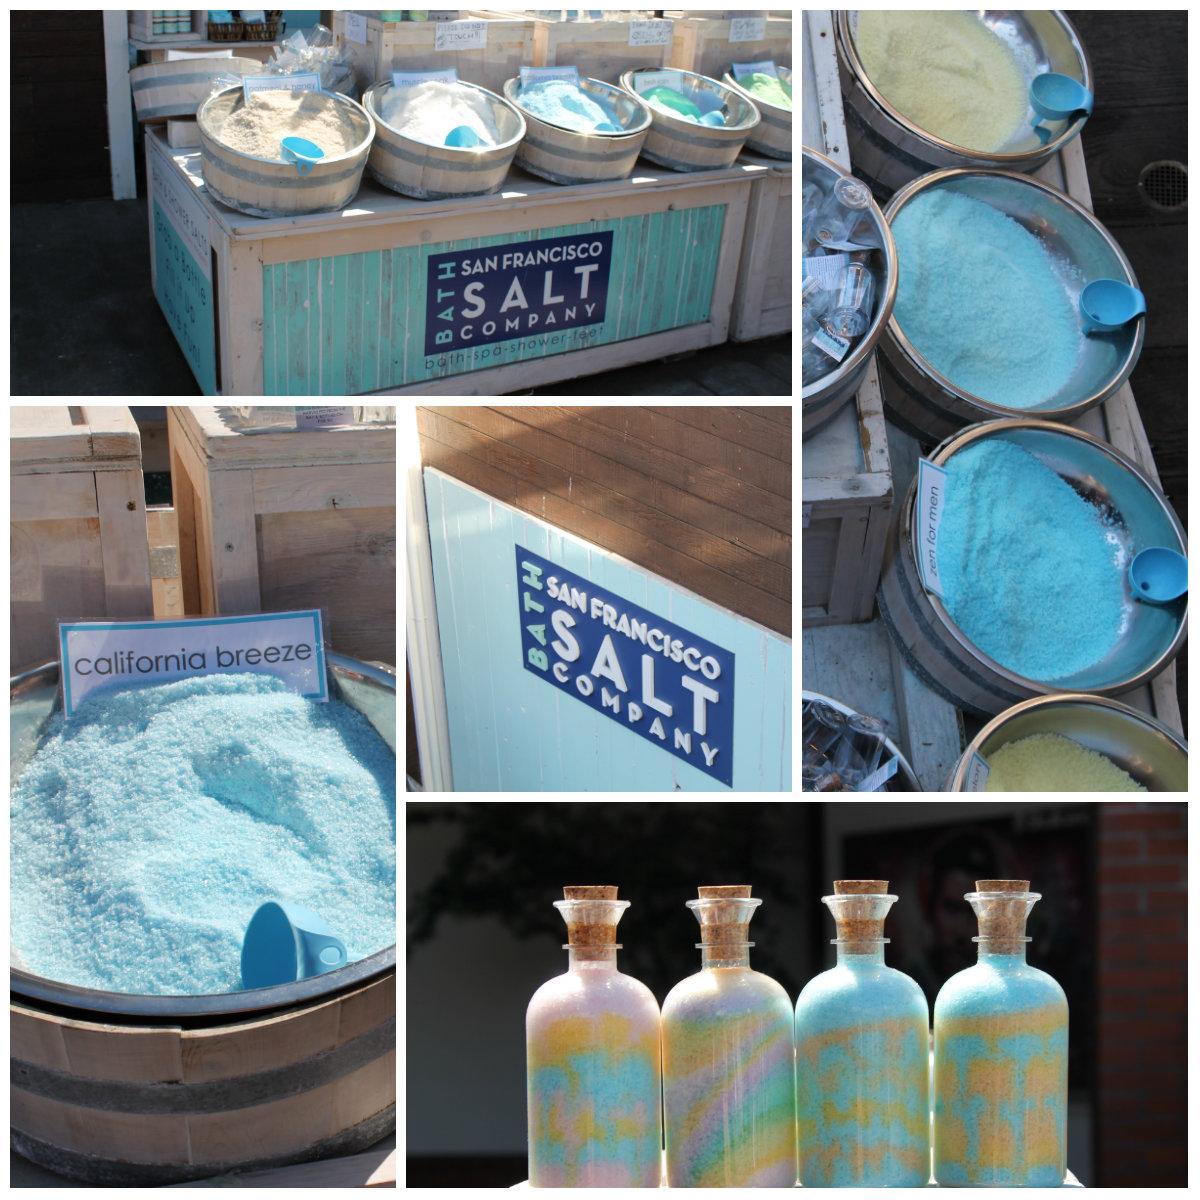 Get free San Francisco Bath Salt Company coupon codes, promo codes & deals for Nov. Saving money starts at carlnoterva.ml